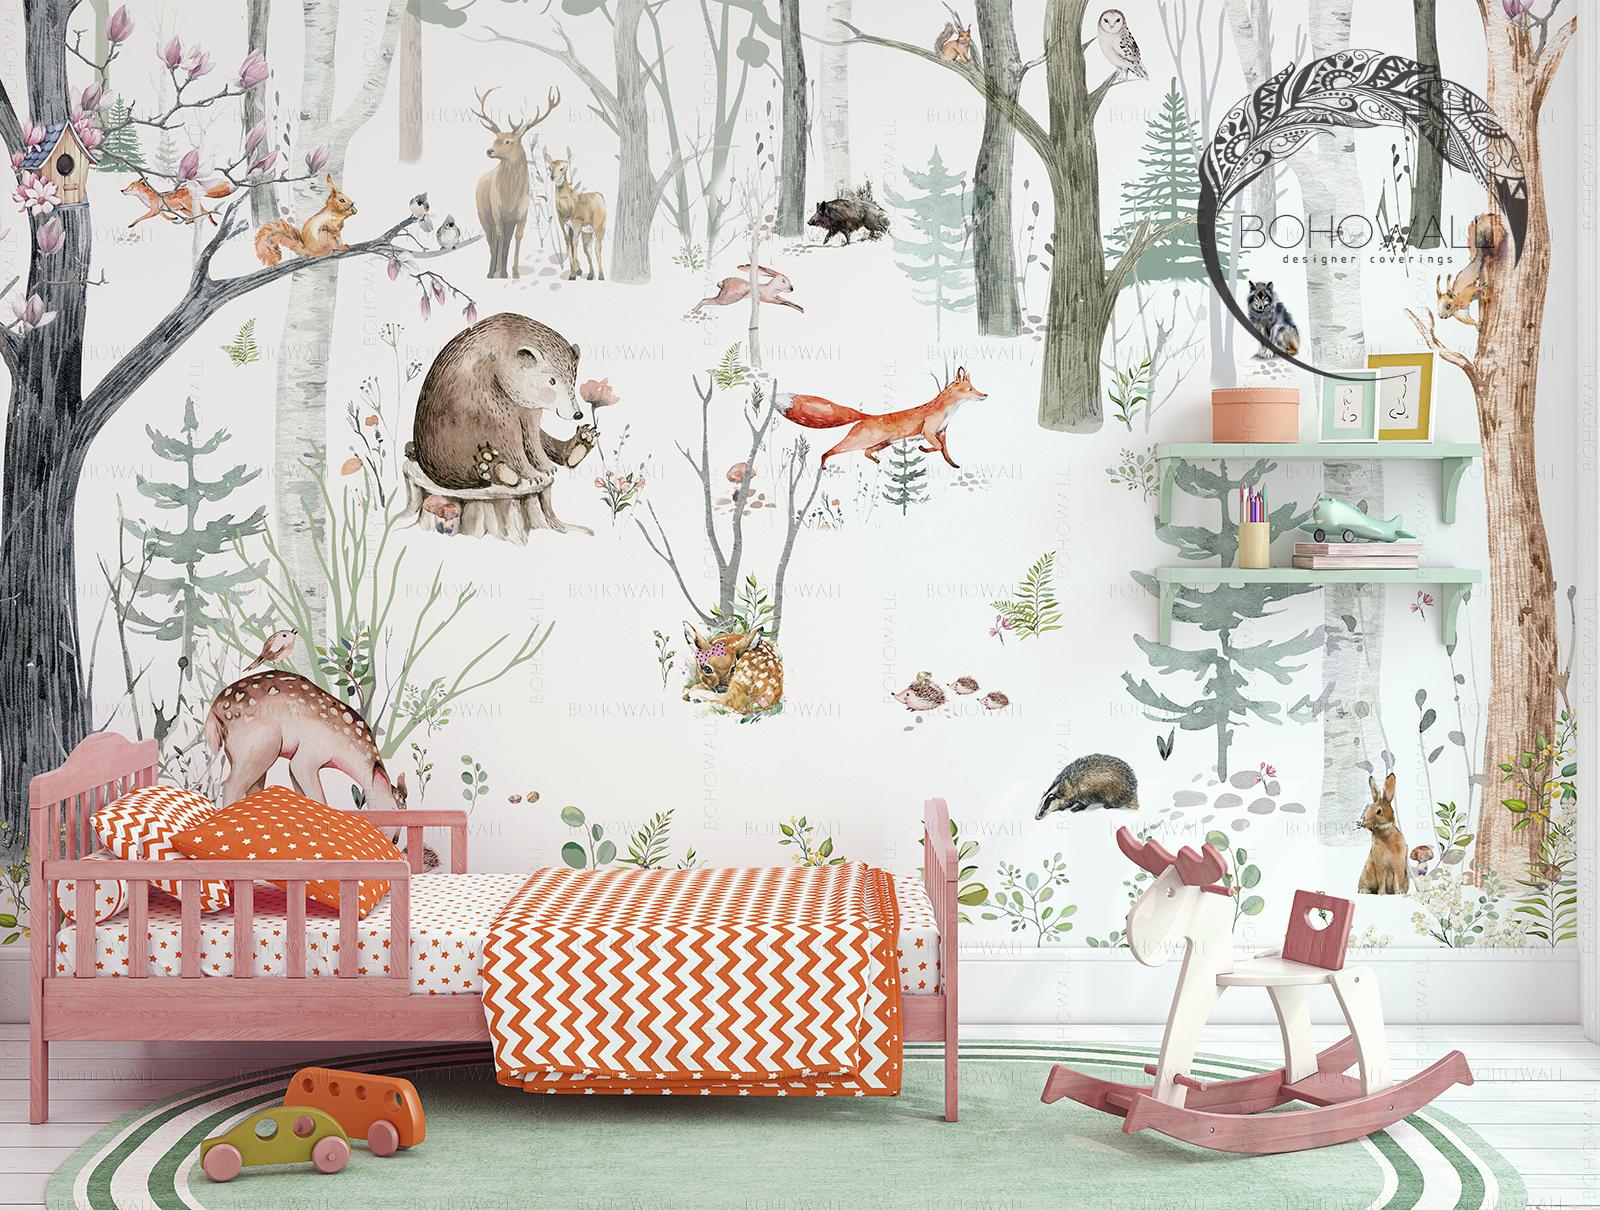 freska_fox_in_the forest_Bohowall_int